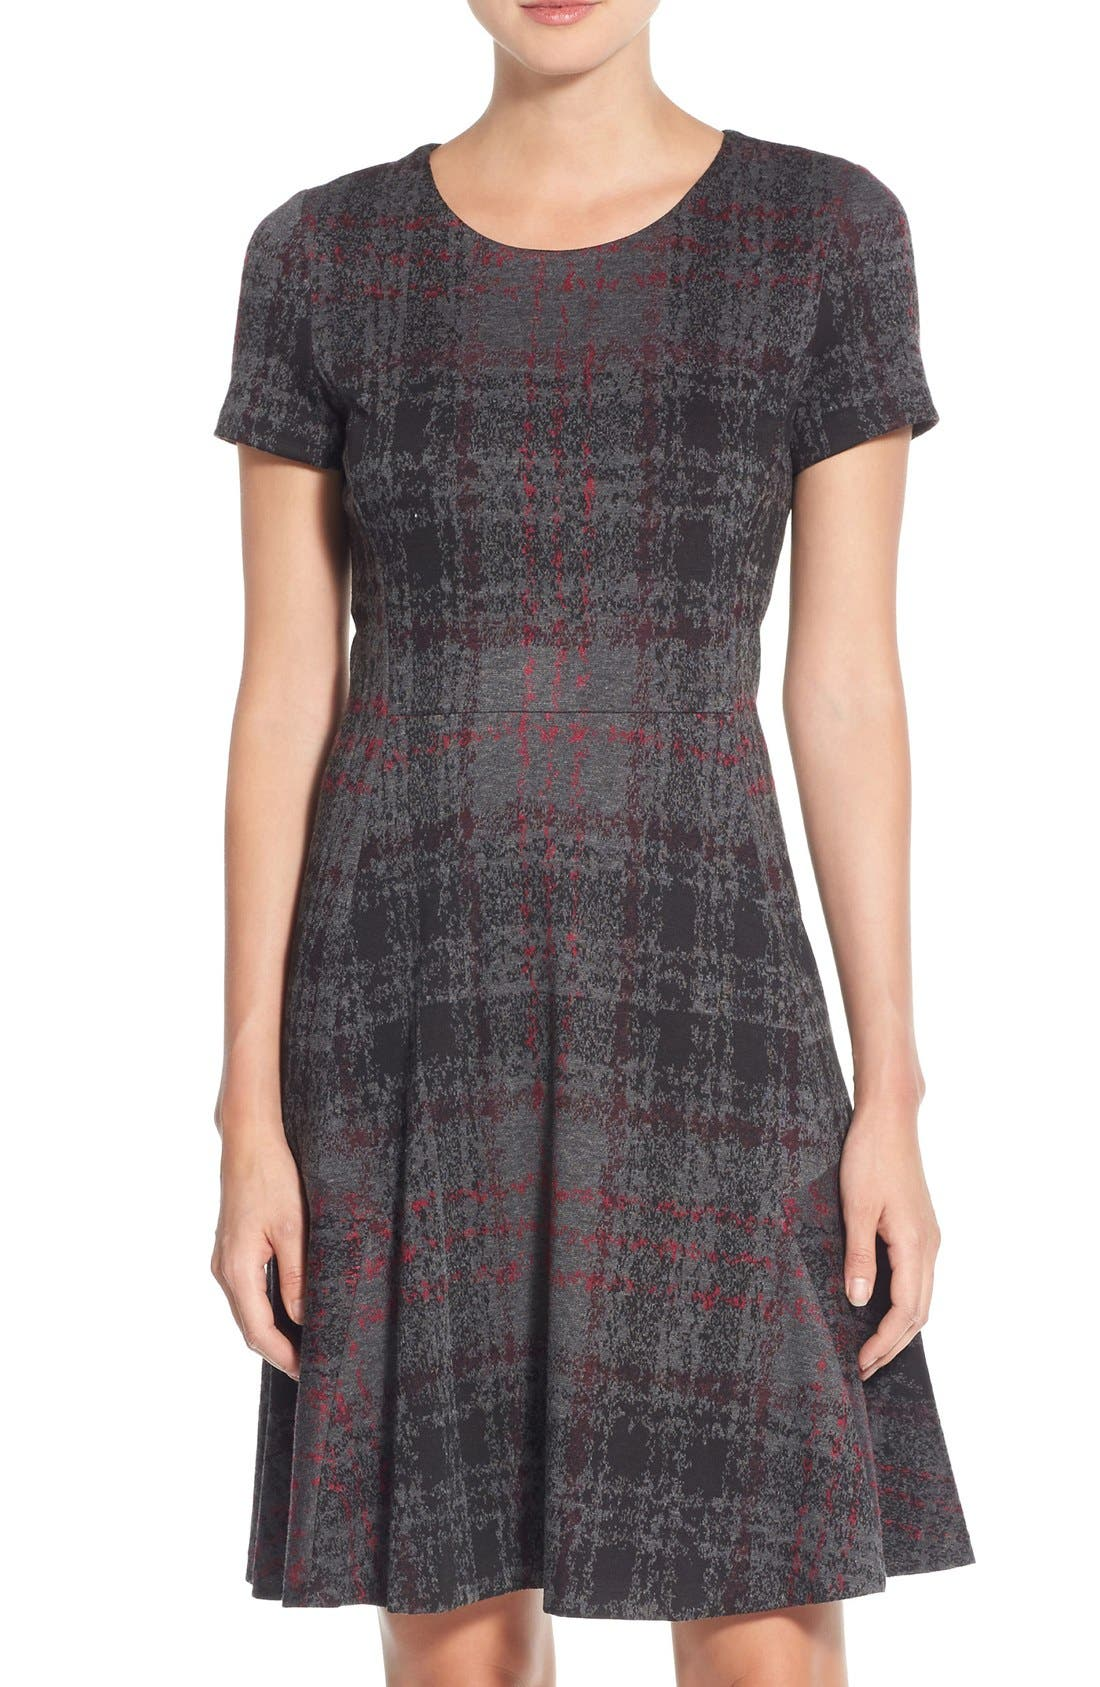 Alternate Image 1 Selected - Betsey Johnson Print Ponte Fit & Flare Dress